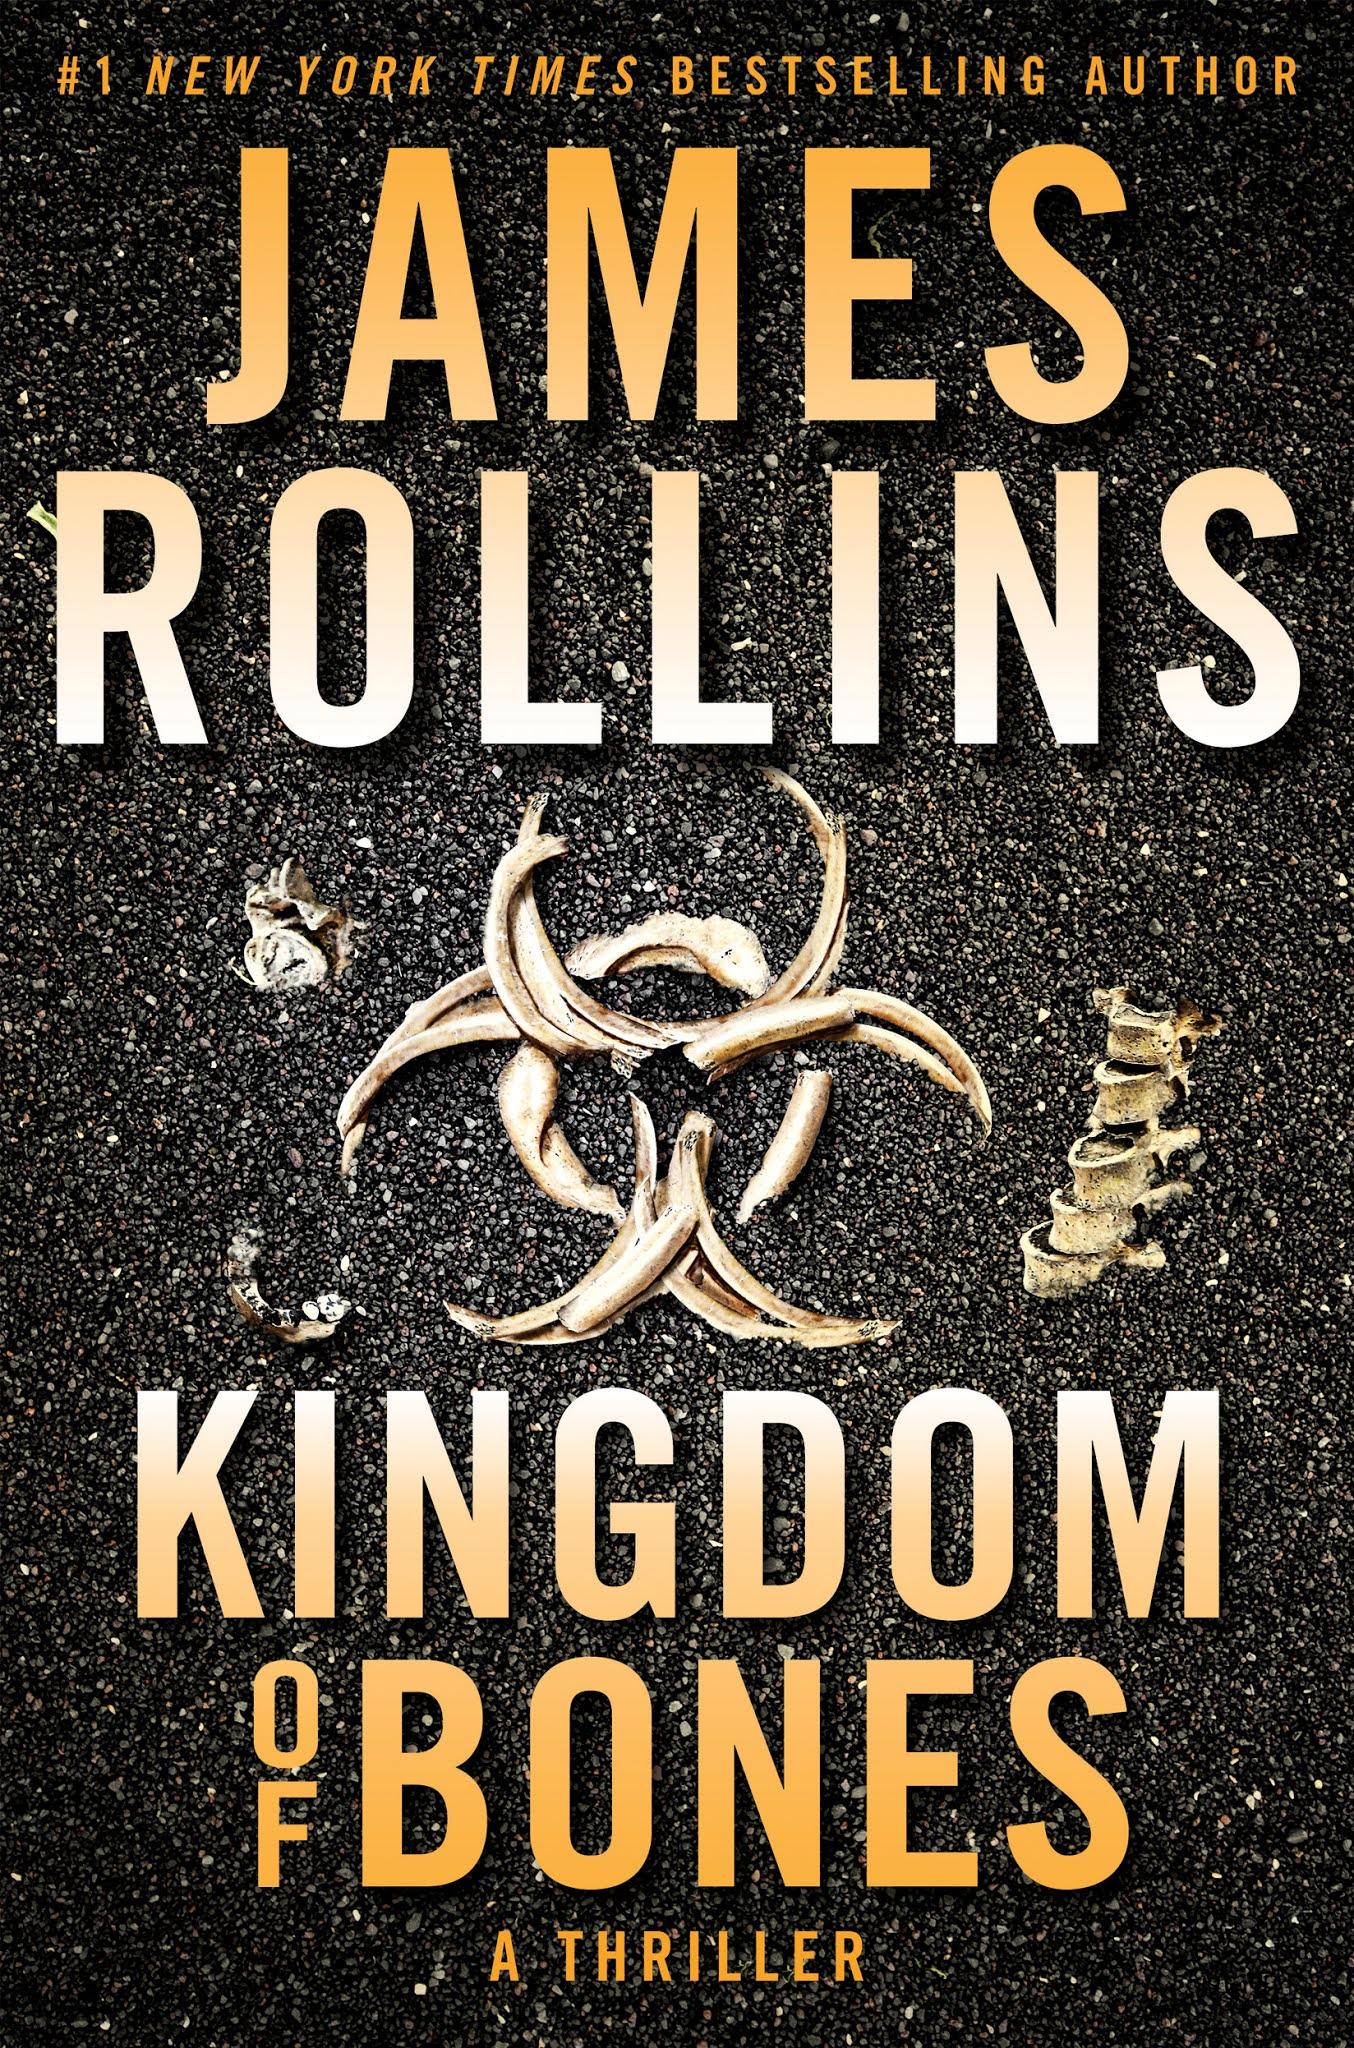 Kingdom of Bones by James Rollins